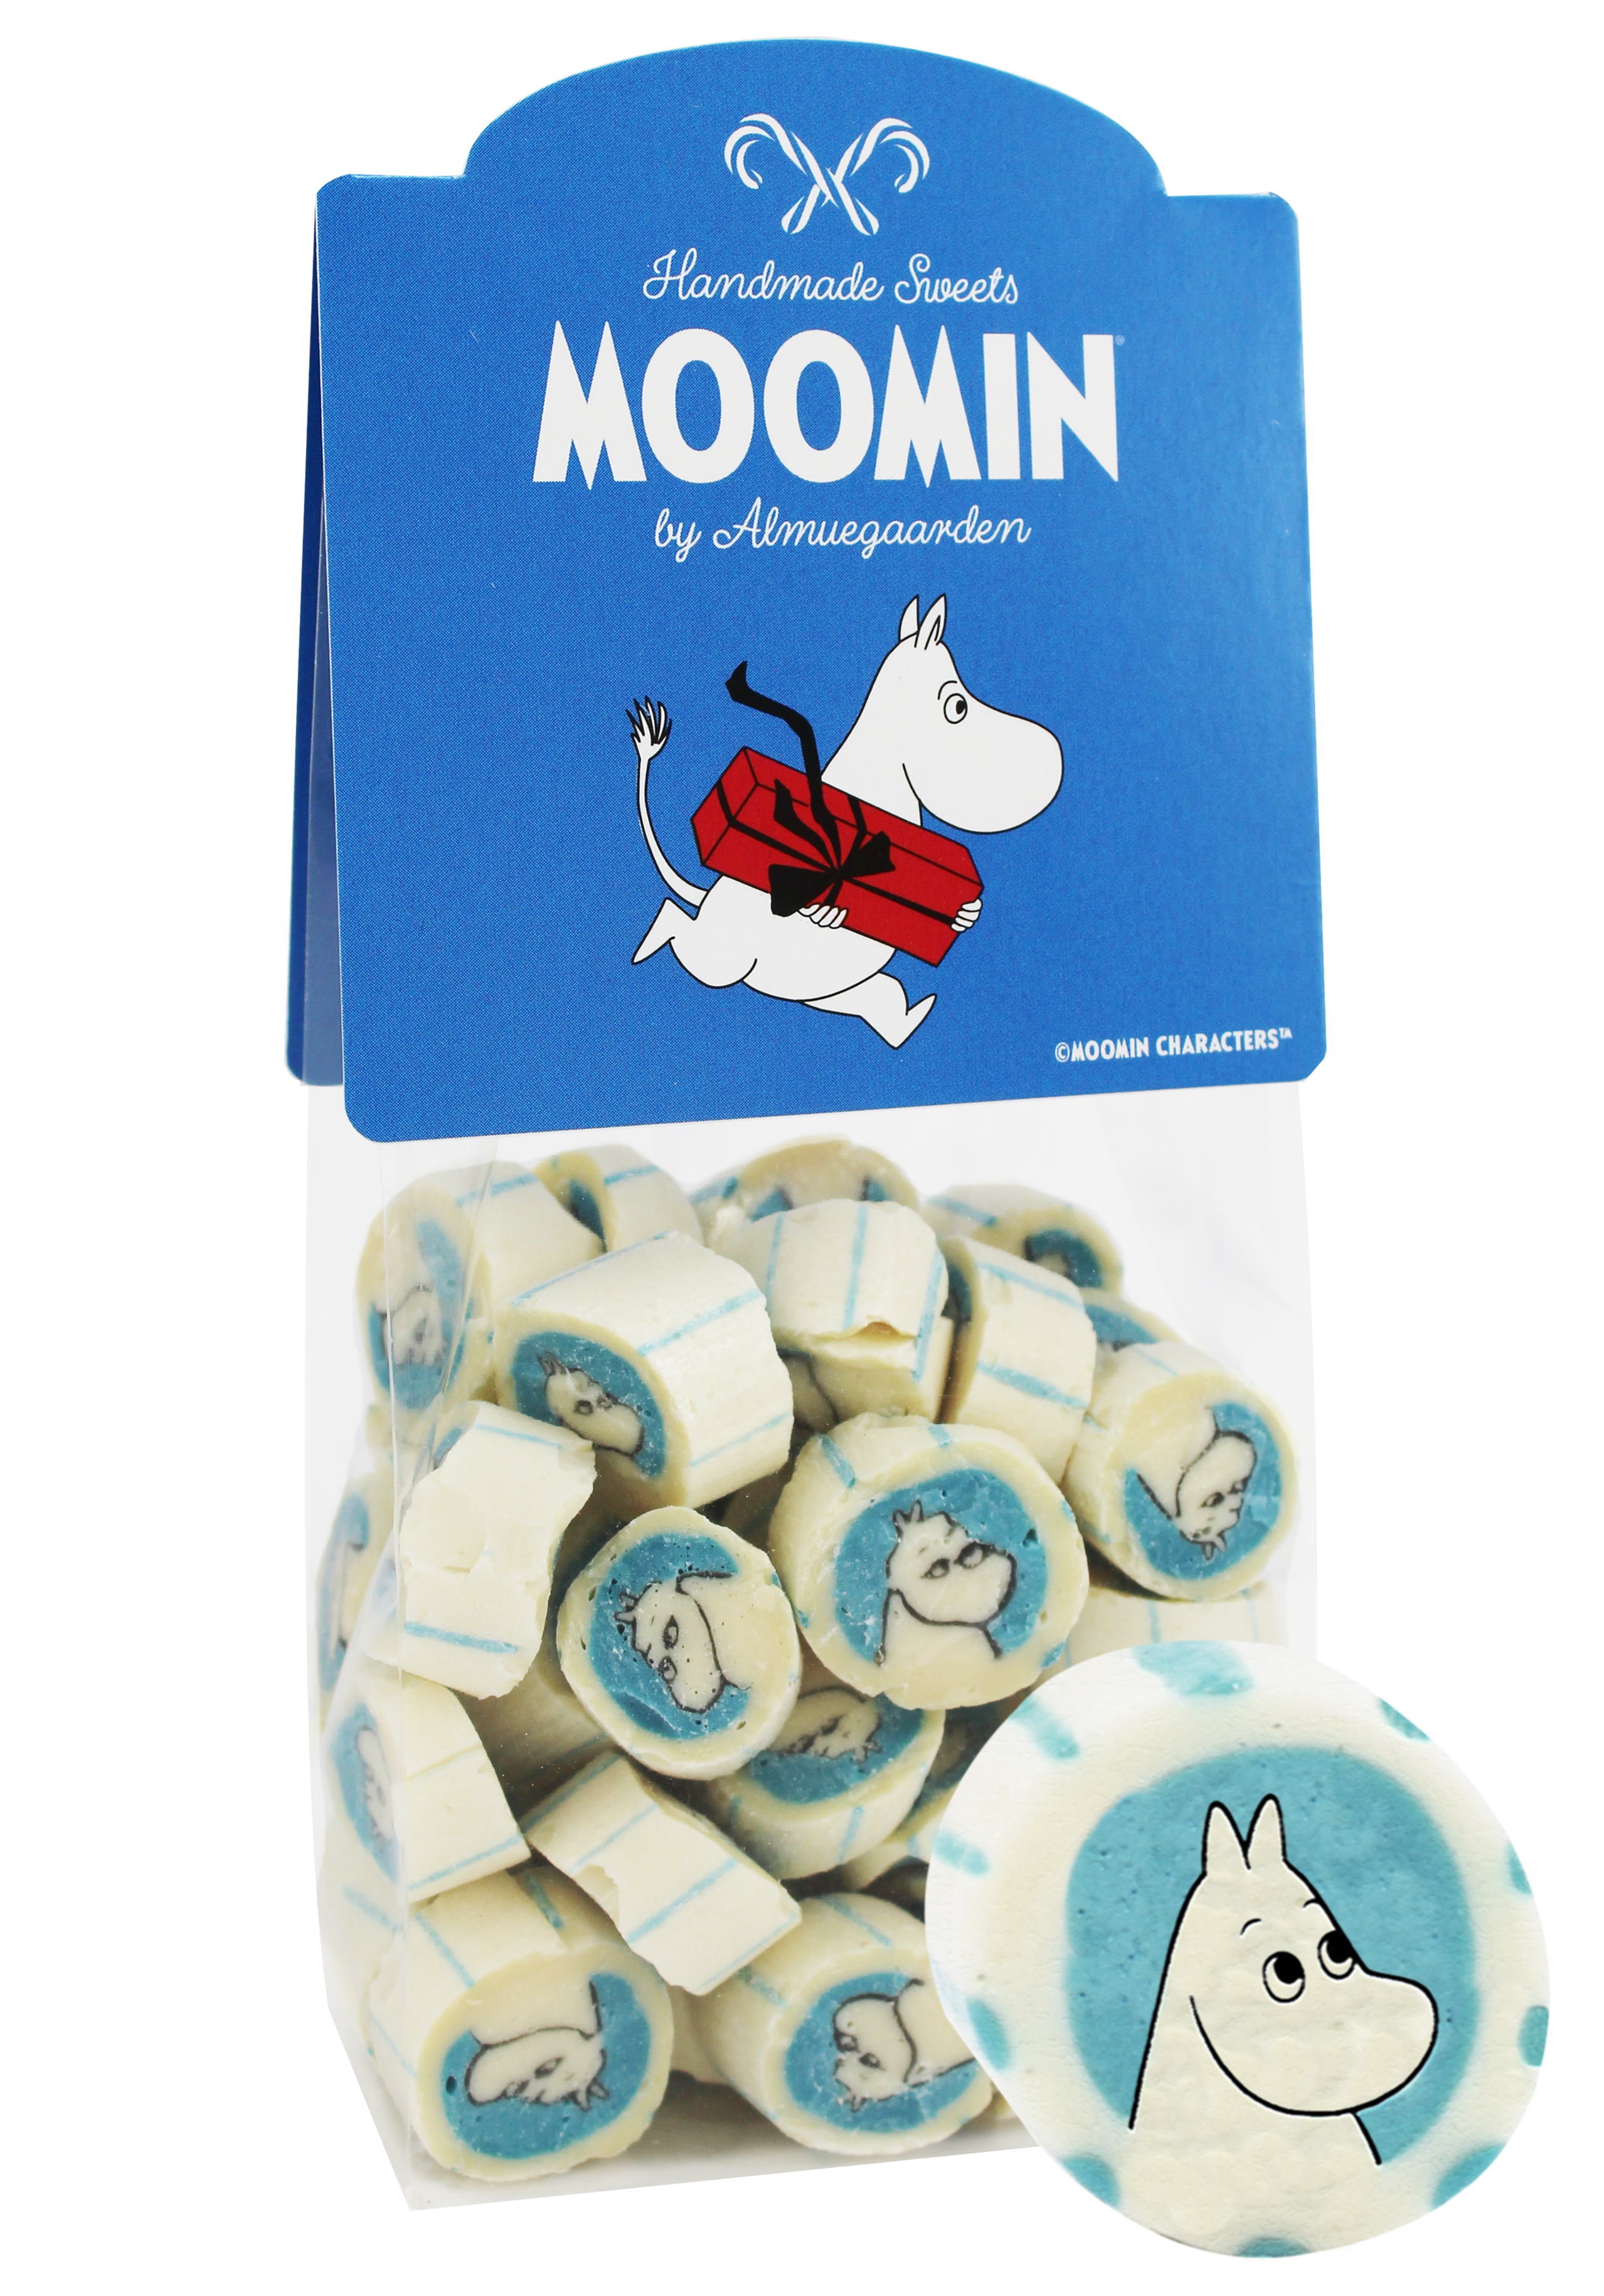 MOOMIN by Almuegaarden - Moomintroll Sweets